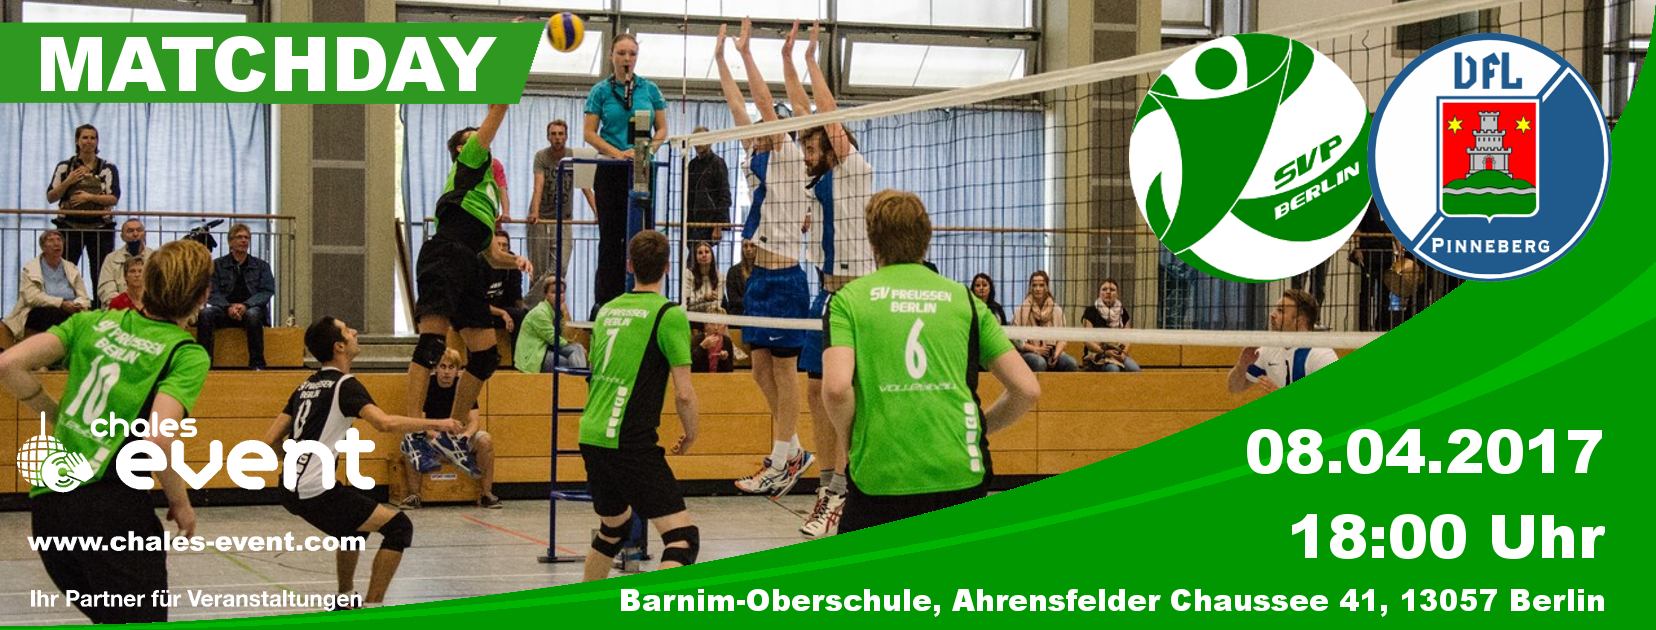 Heimspiel gegen den VfL Pinneberg